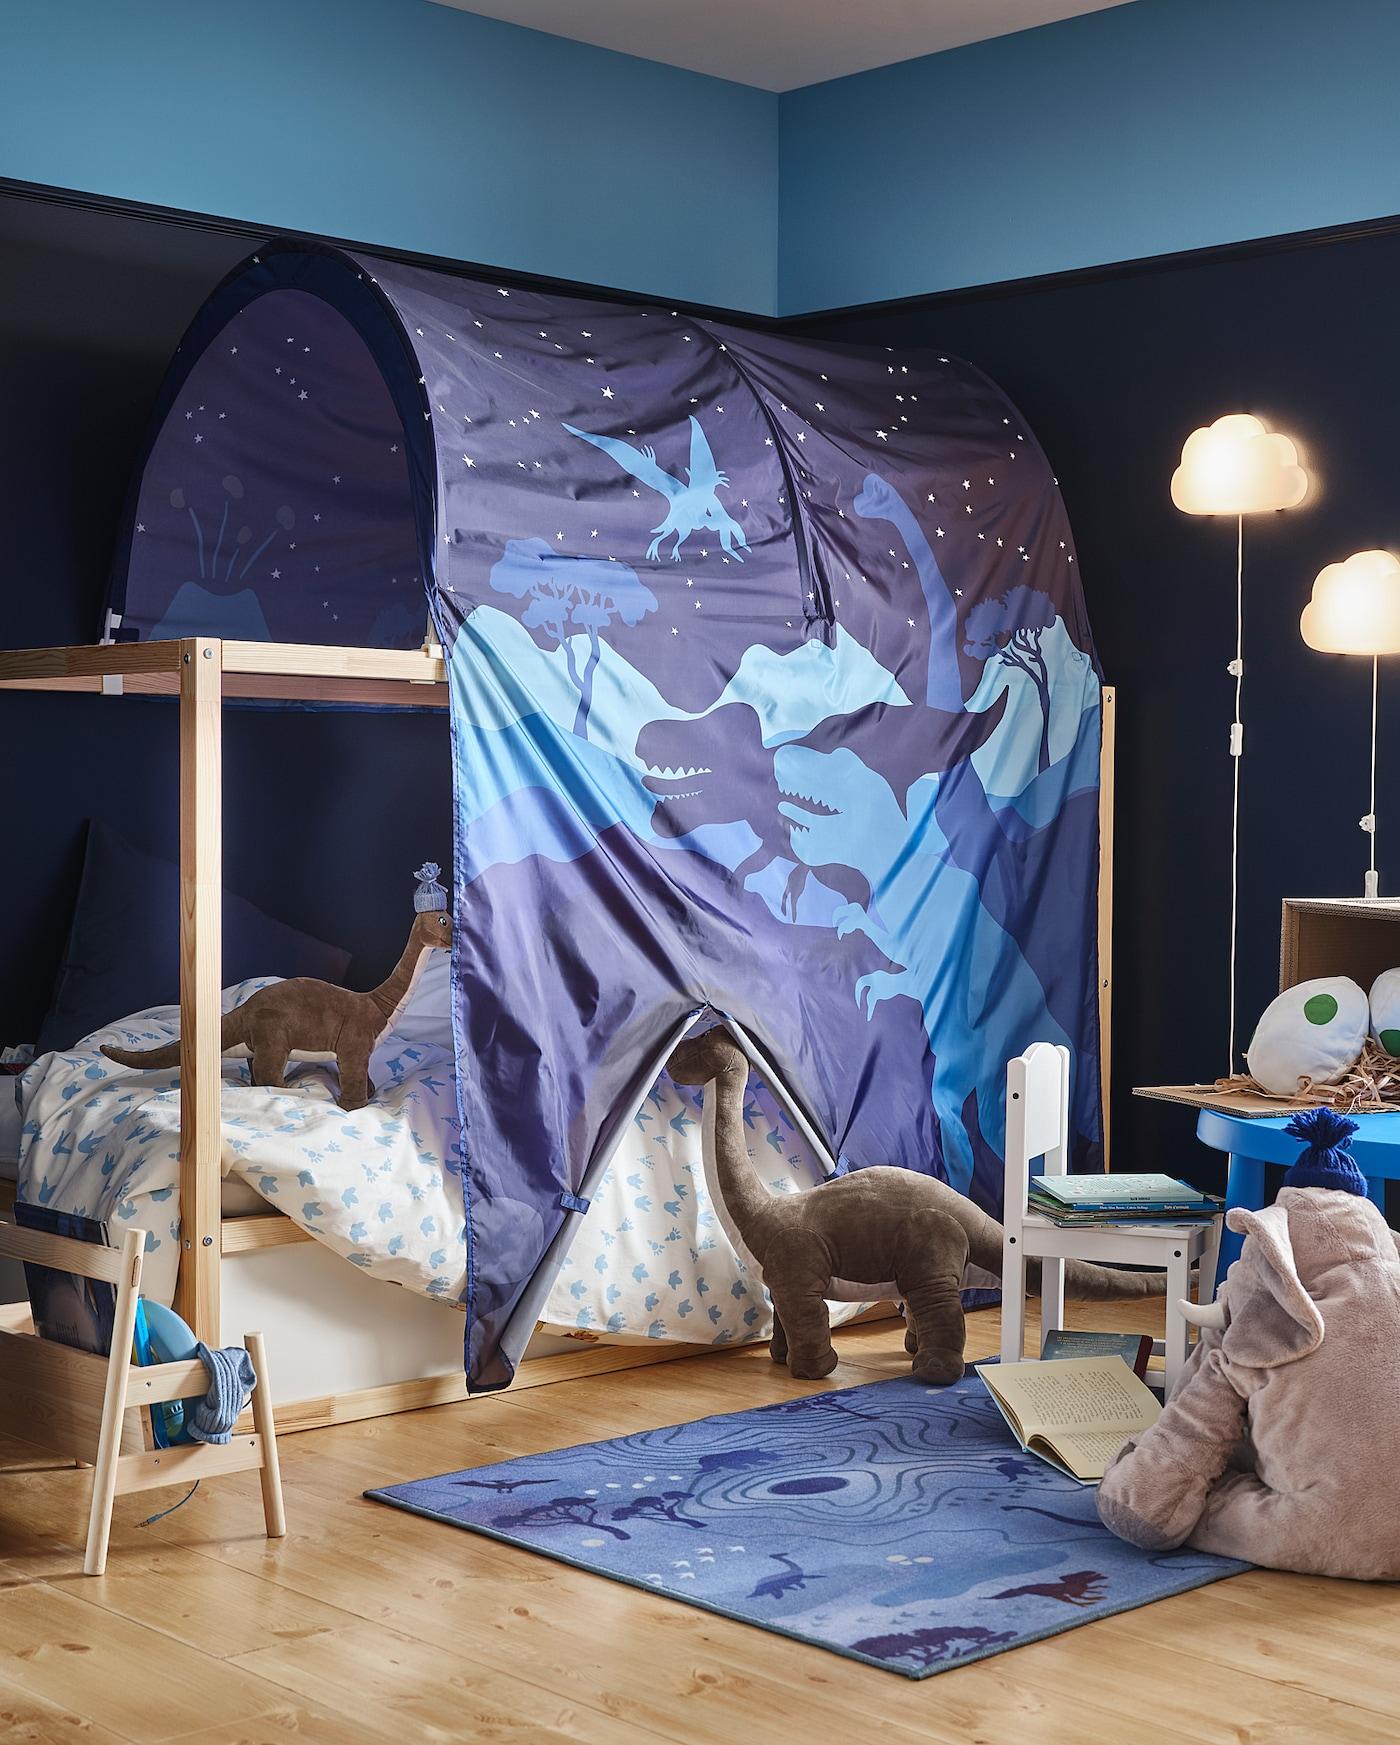 JÄTTELIK Soft toy, dinosaur/dinosaur/brontosaurus, 90 cm